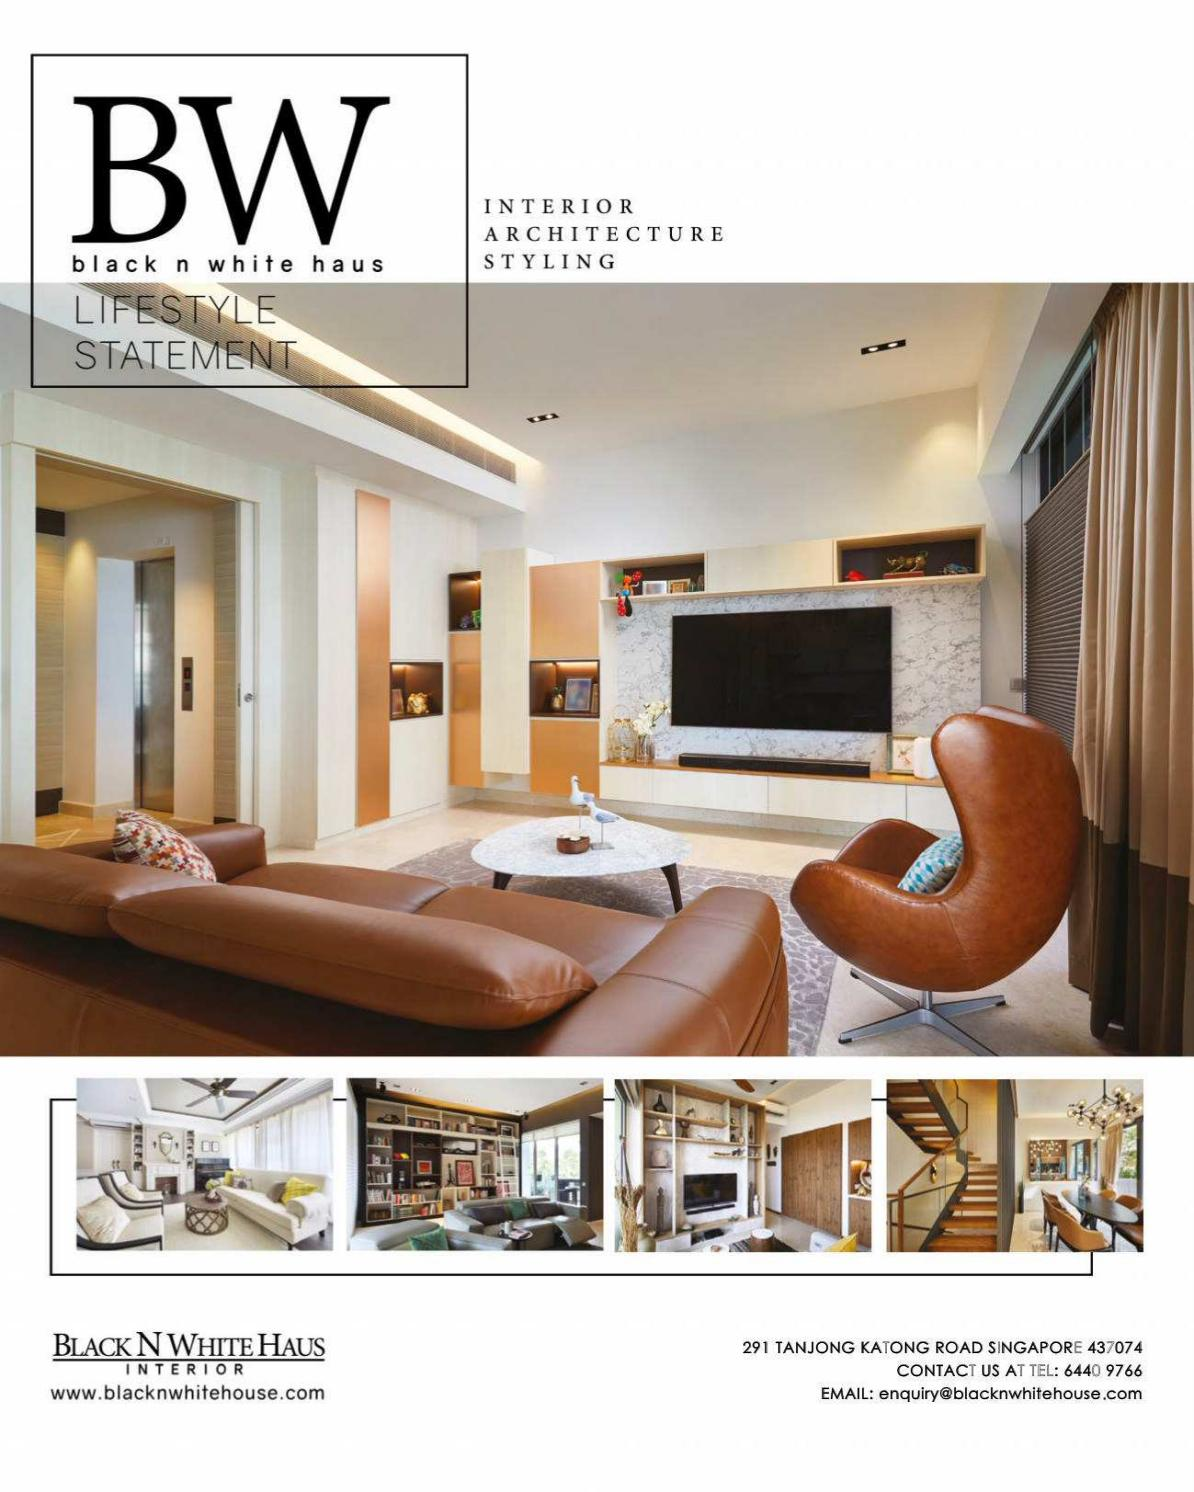 ffe interior design jobs london kentucky